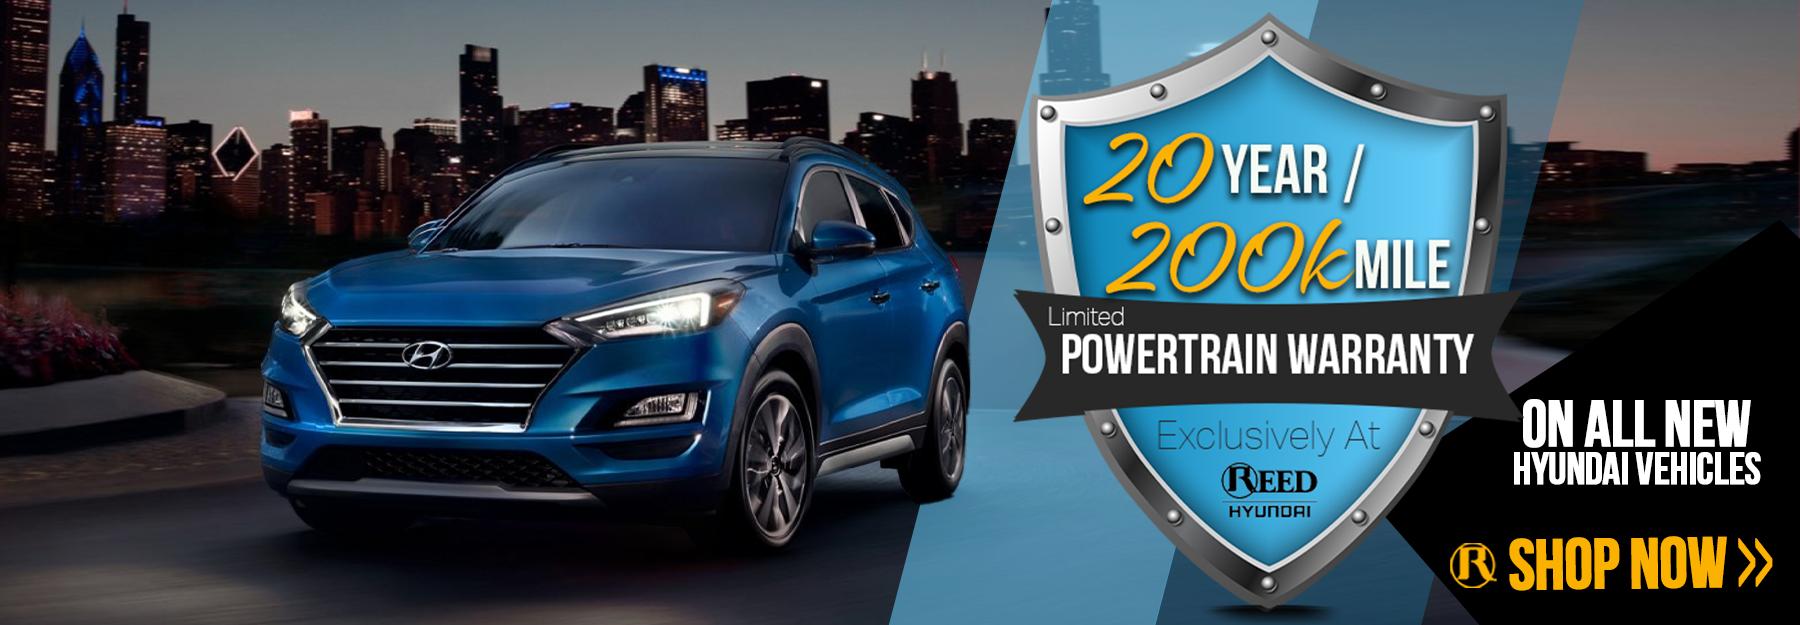 New Hyundai Warranty - 20Year and 200,000 Mile Warranty